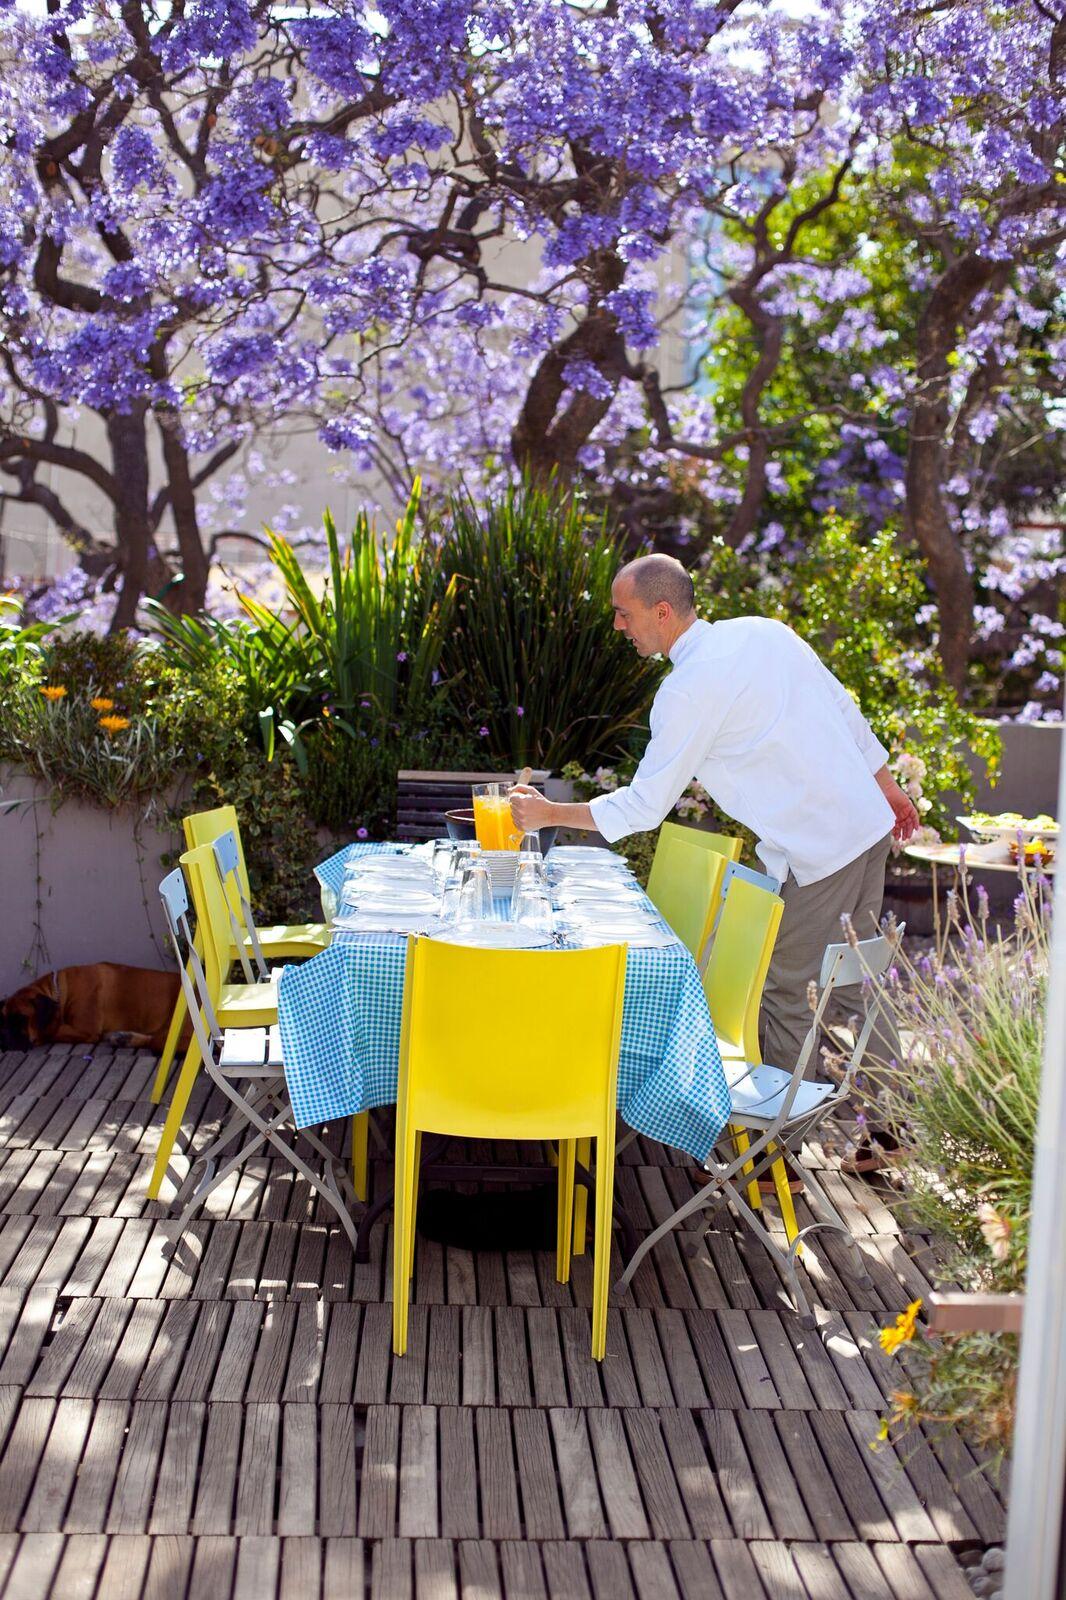 Copy of setting a lunch table beneath a jacaranda tree